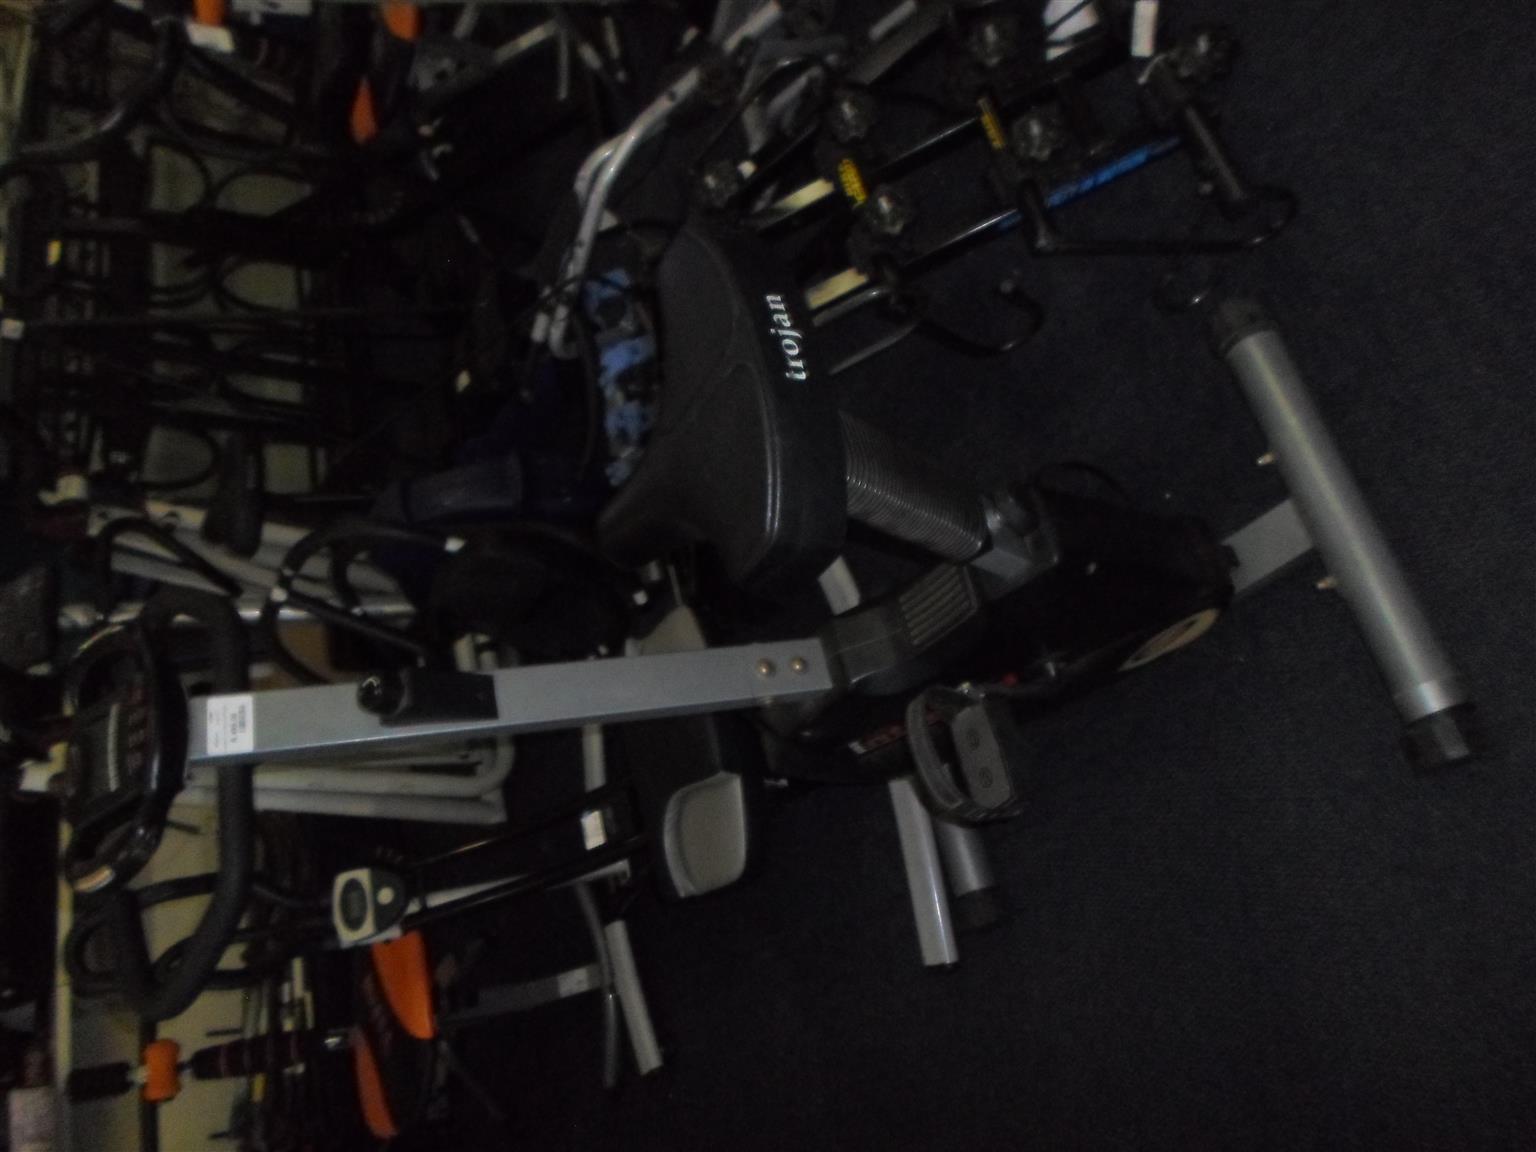 Trojan Interpid Exercise Bicycle